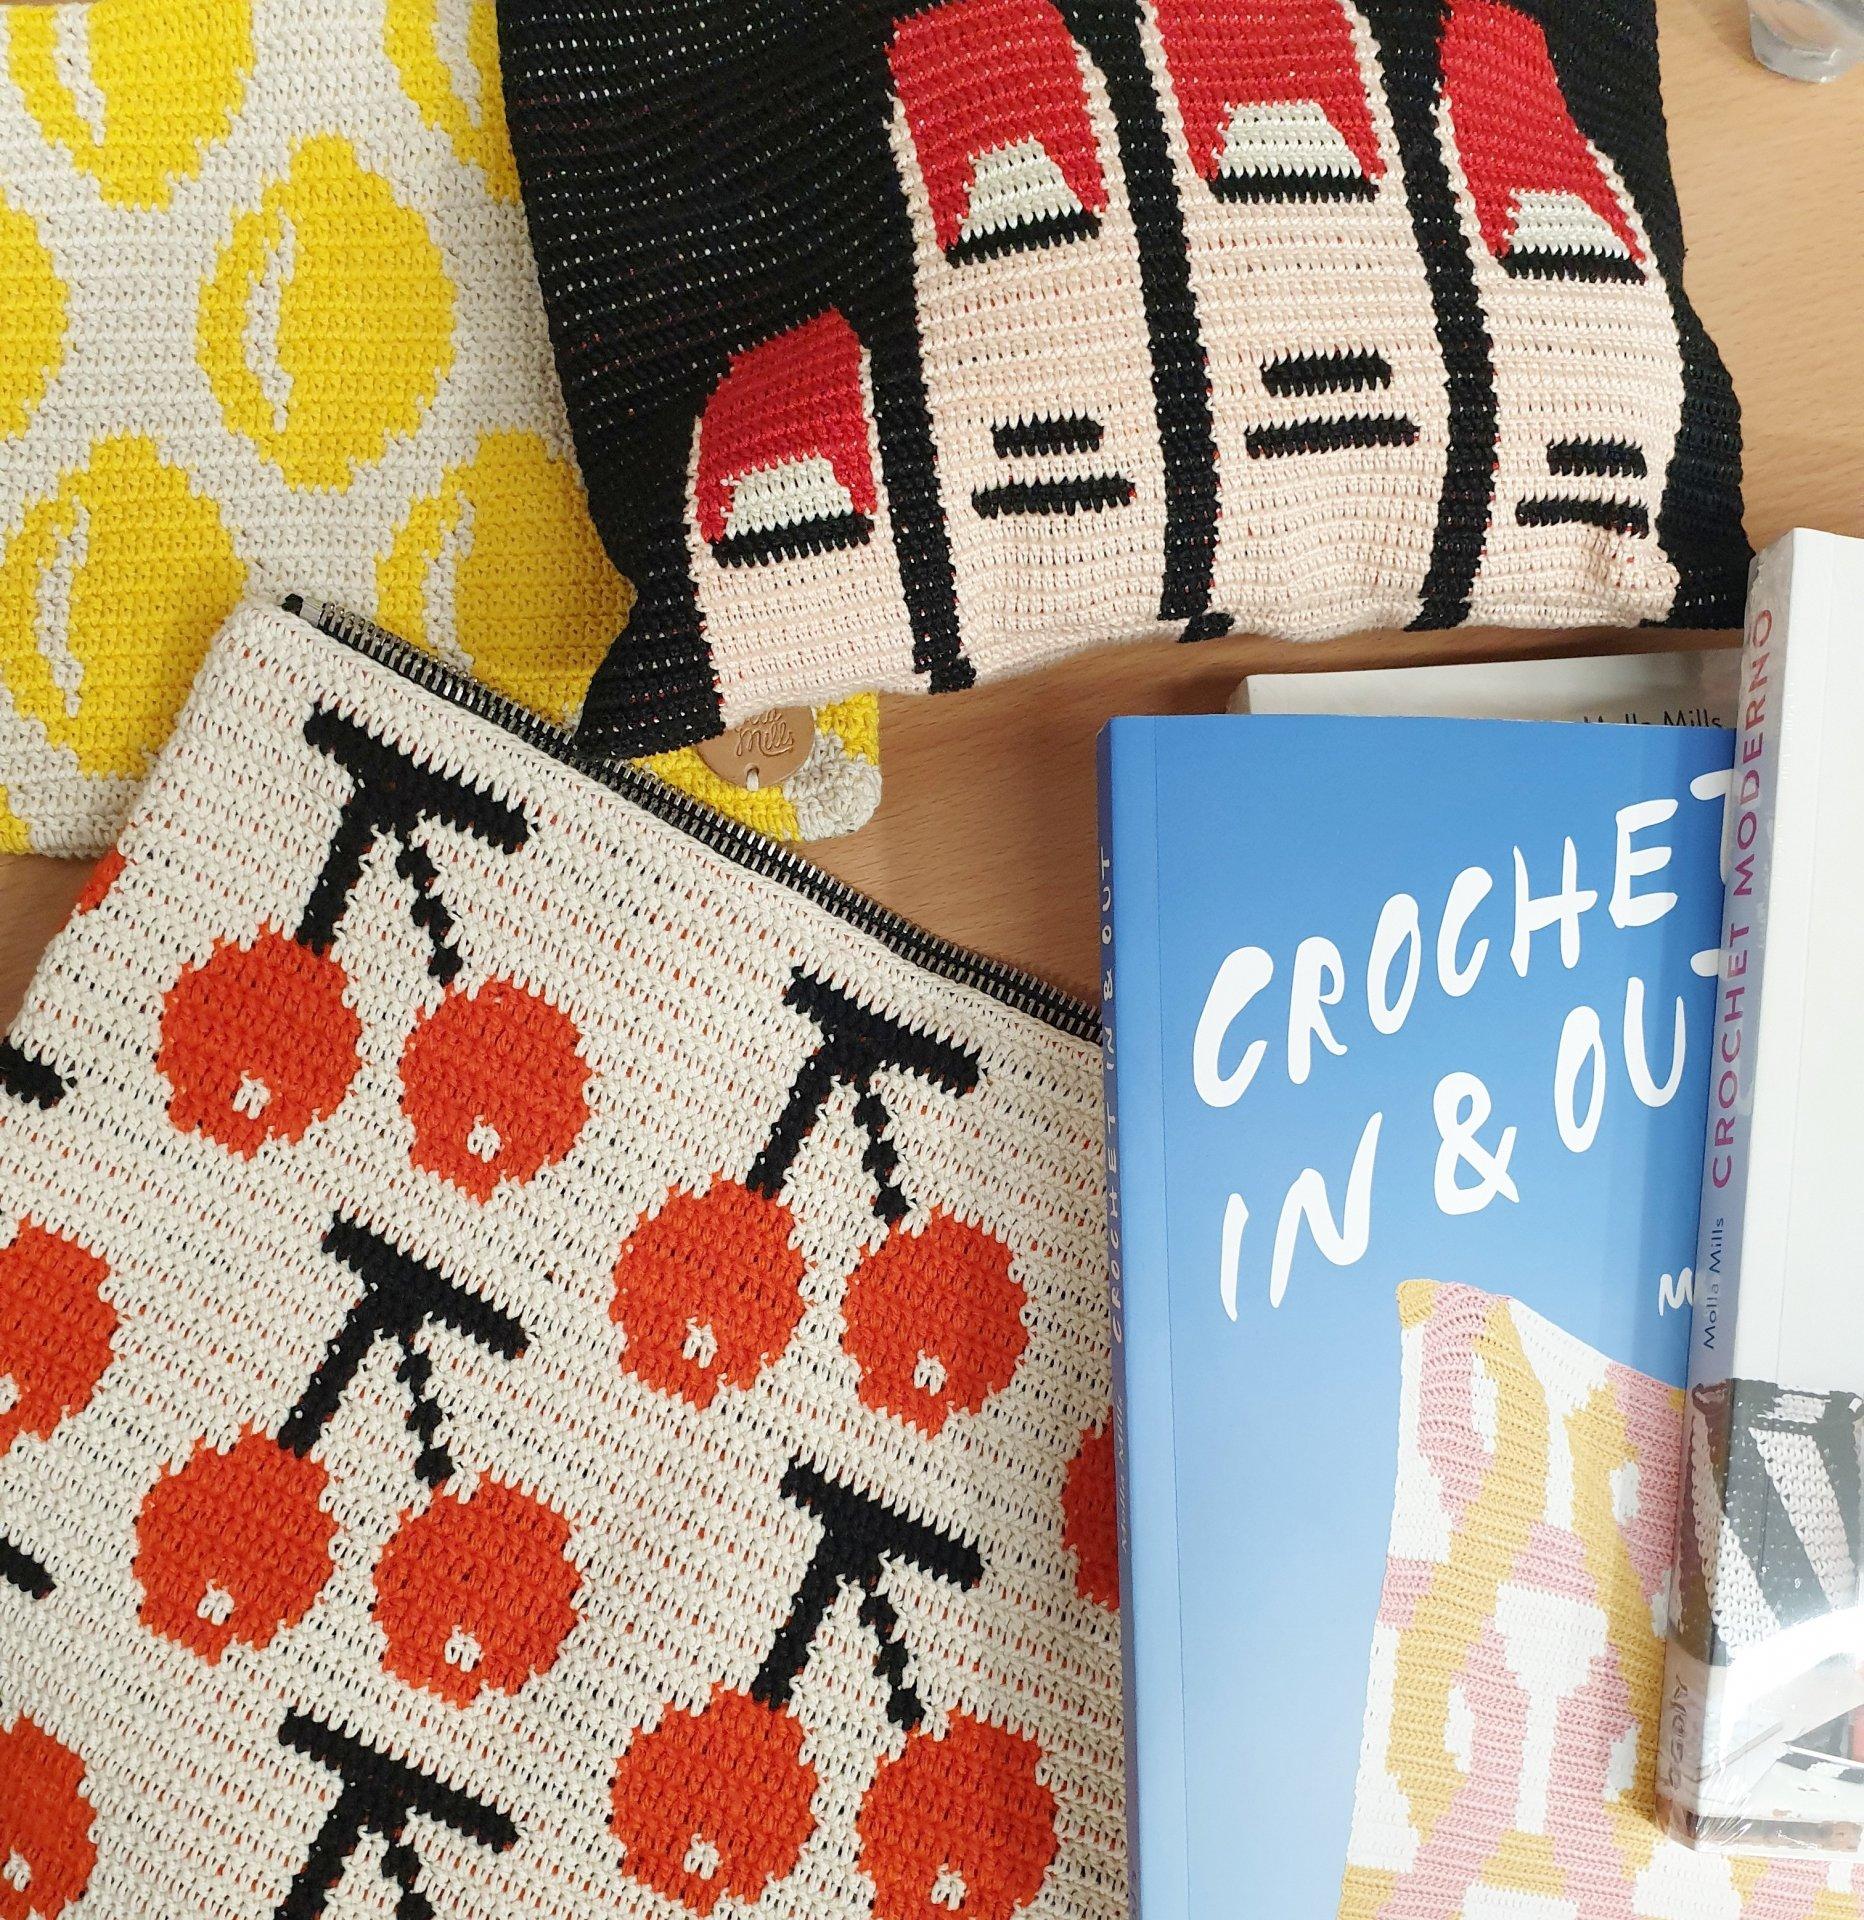 Molla diseños crochet moderno Lola Botona Granollers